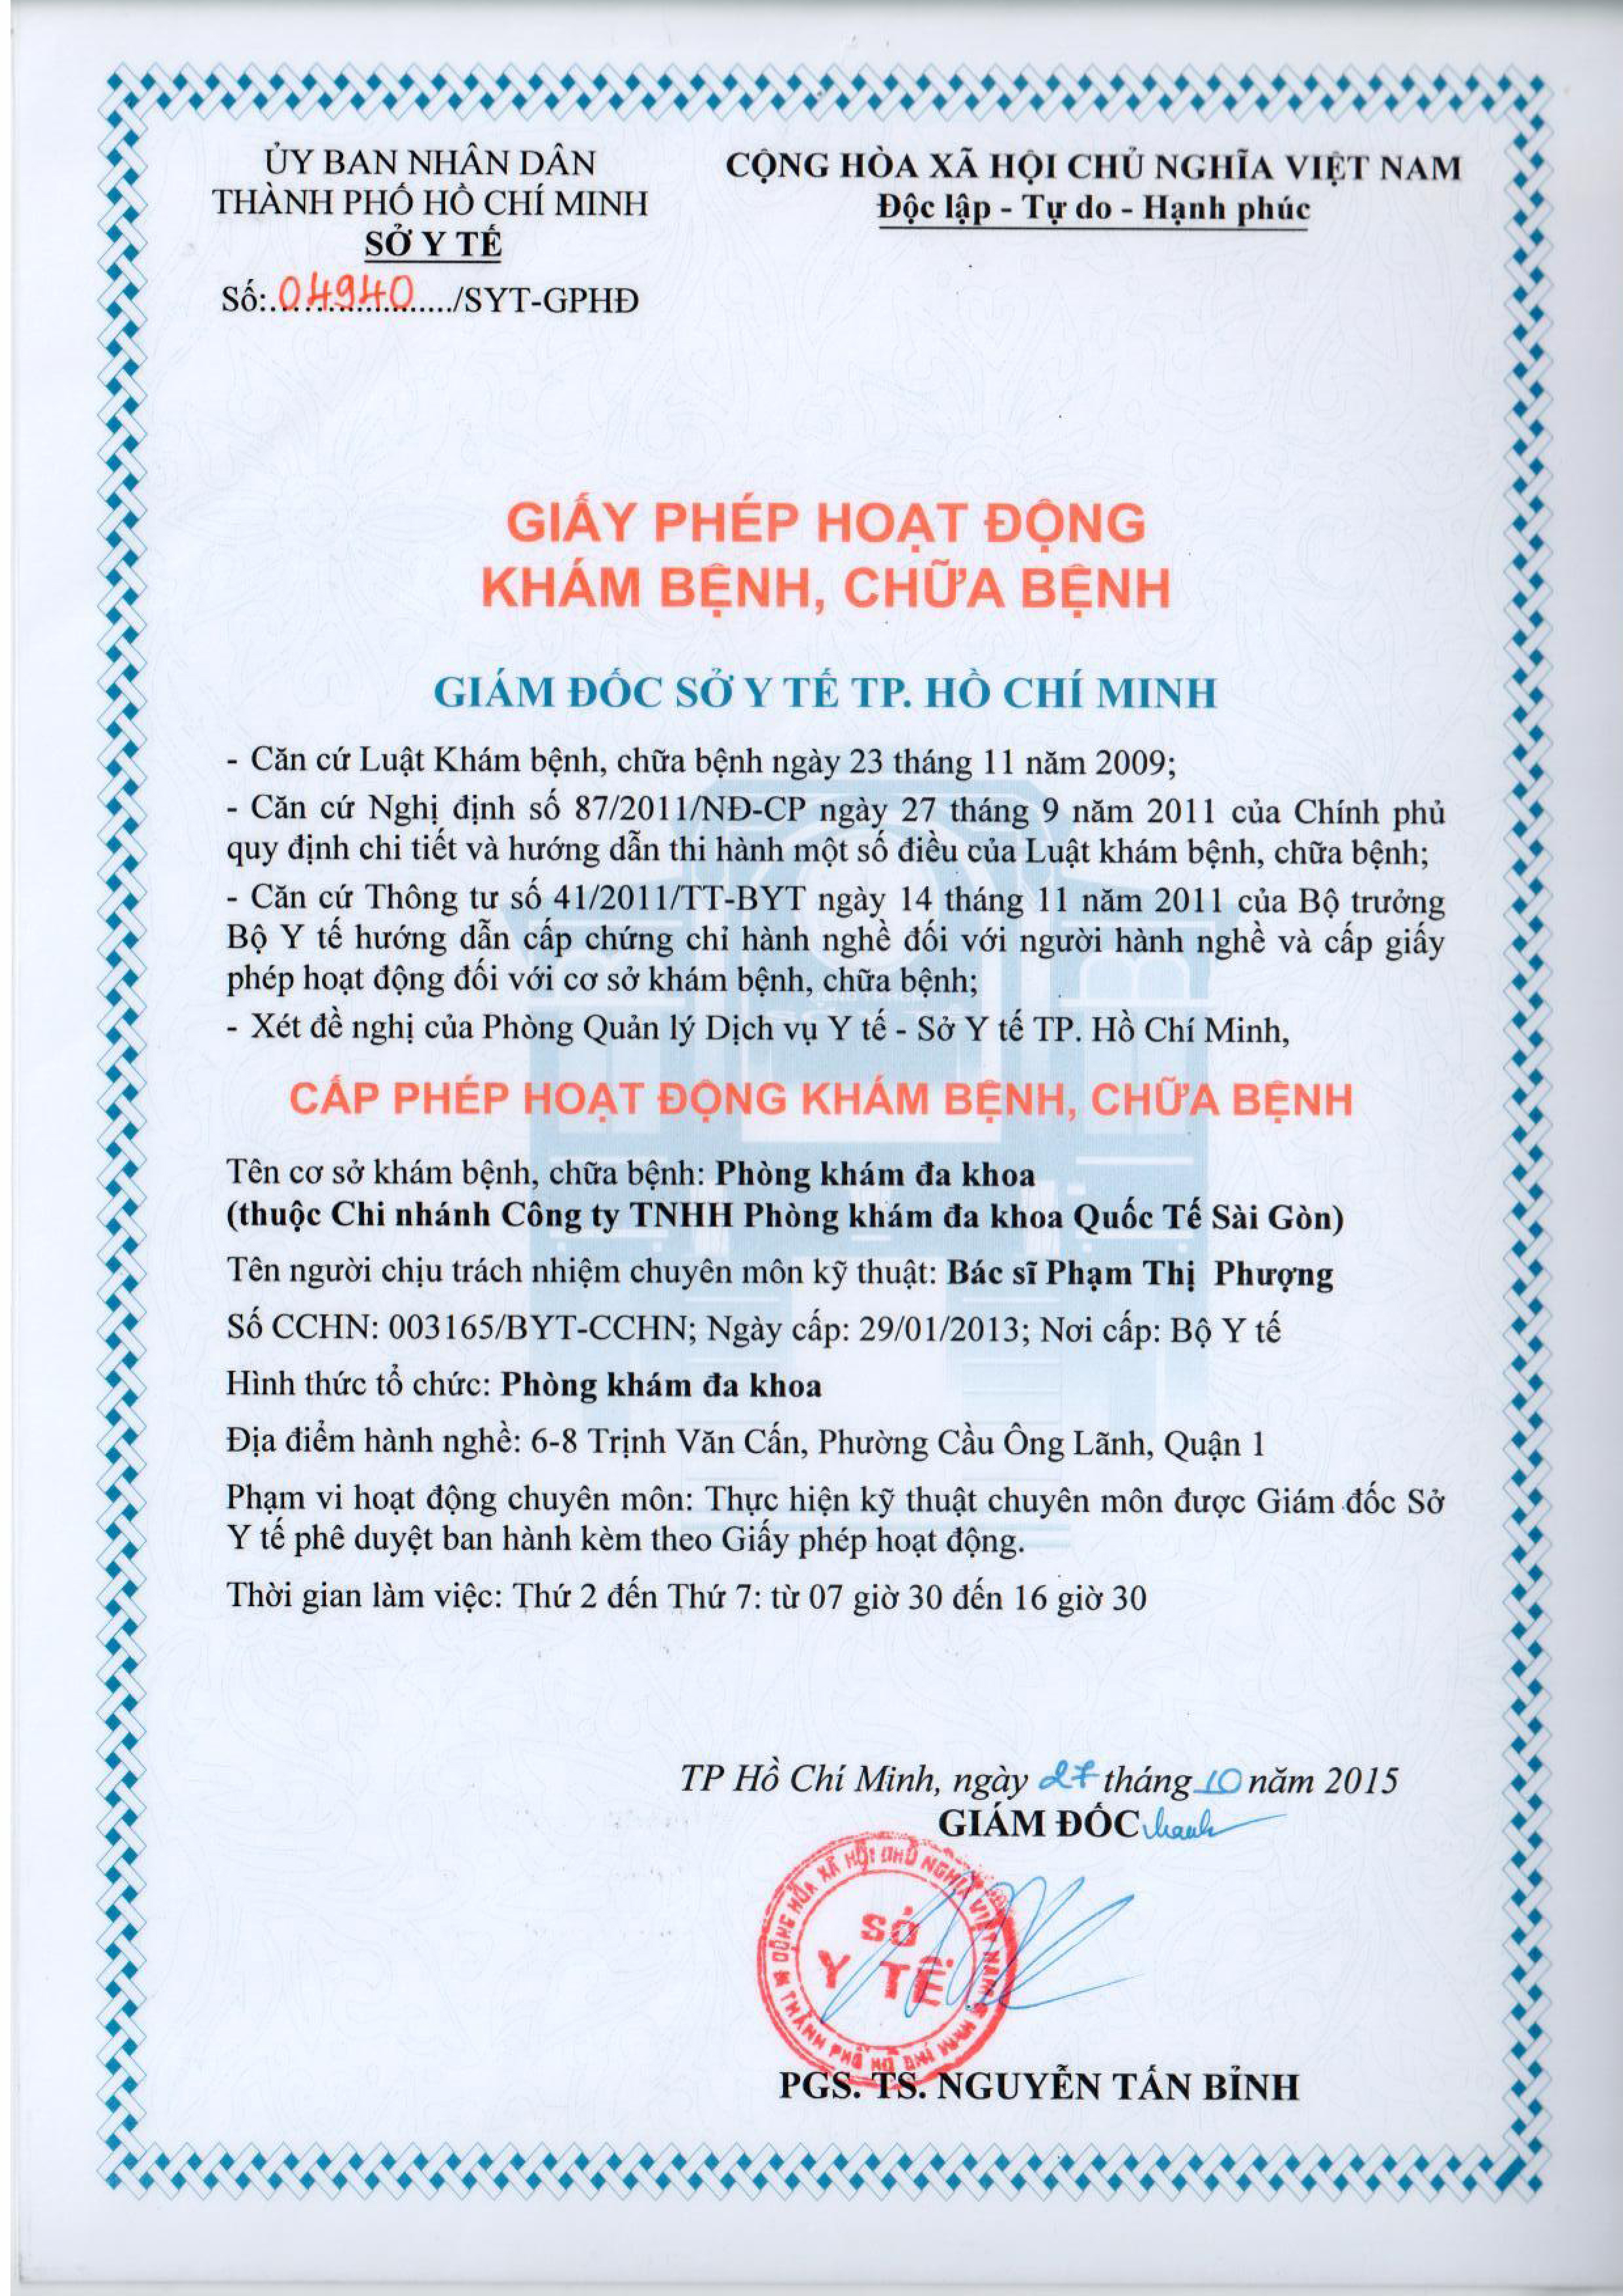 GIAY PHEP HOAT DONG KCB 6-8-TAIMUIHONGSG.JPG